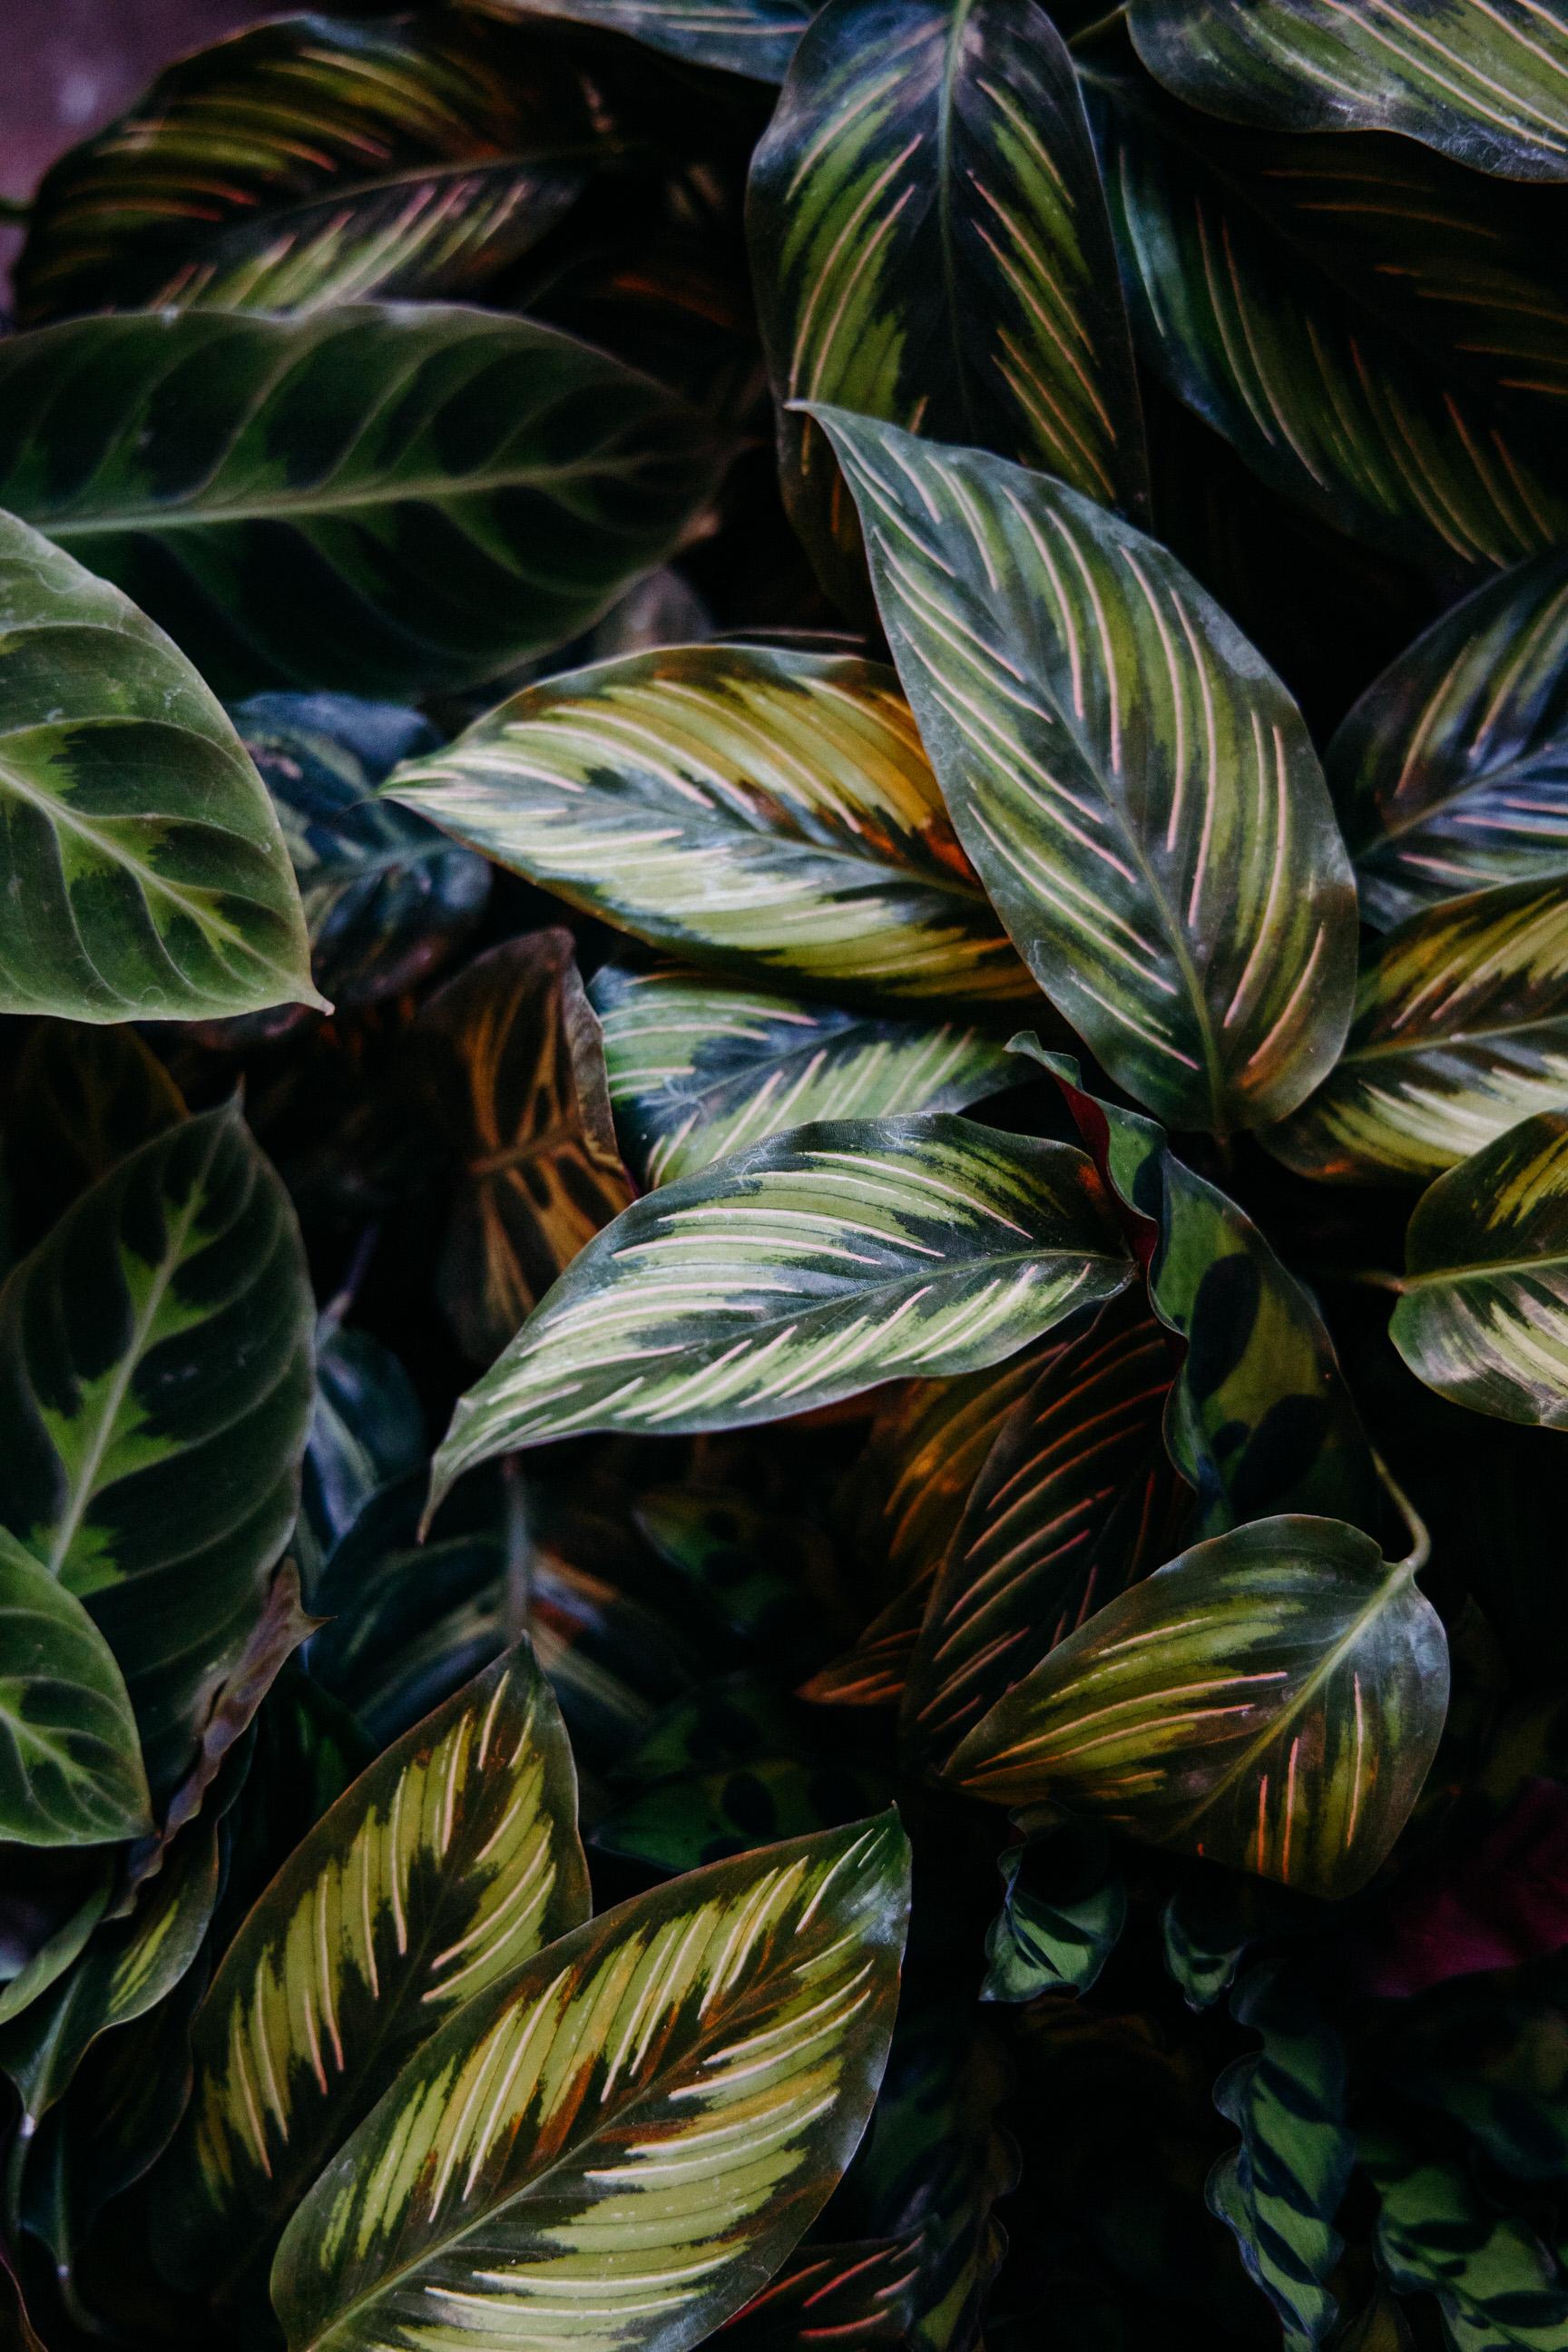 stem-hes+flora-4001-1.jpg